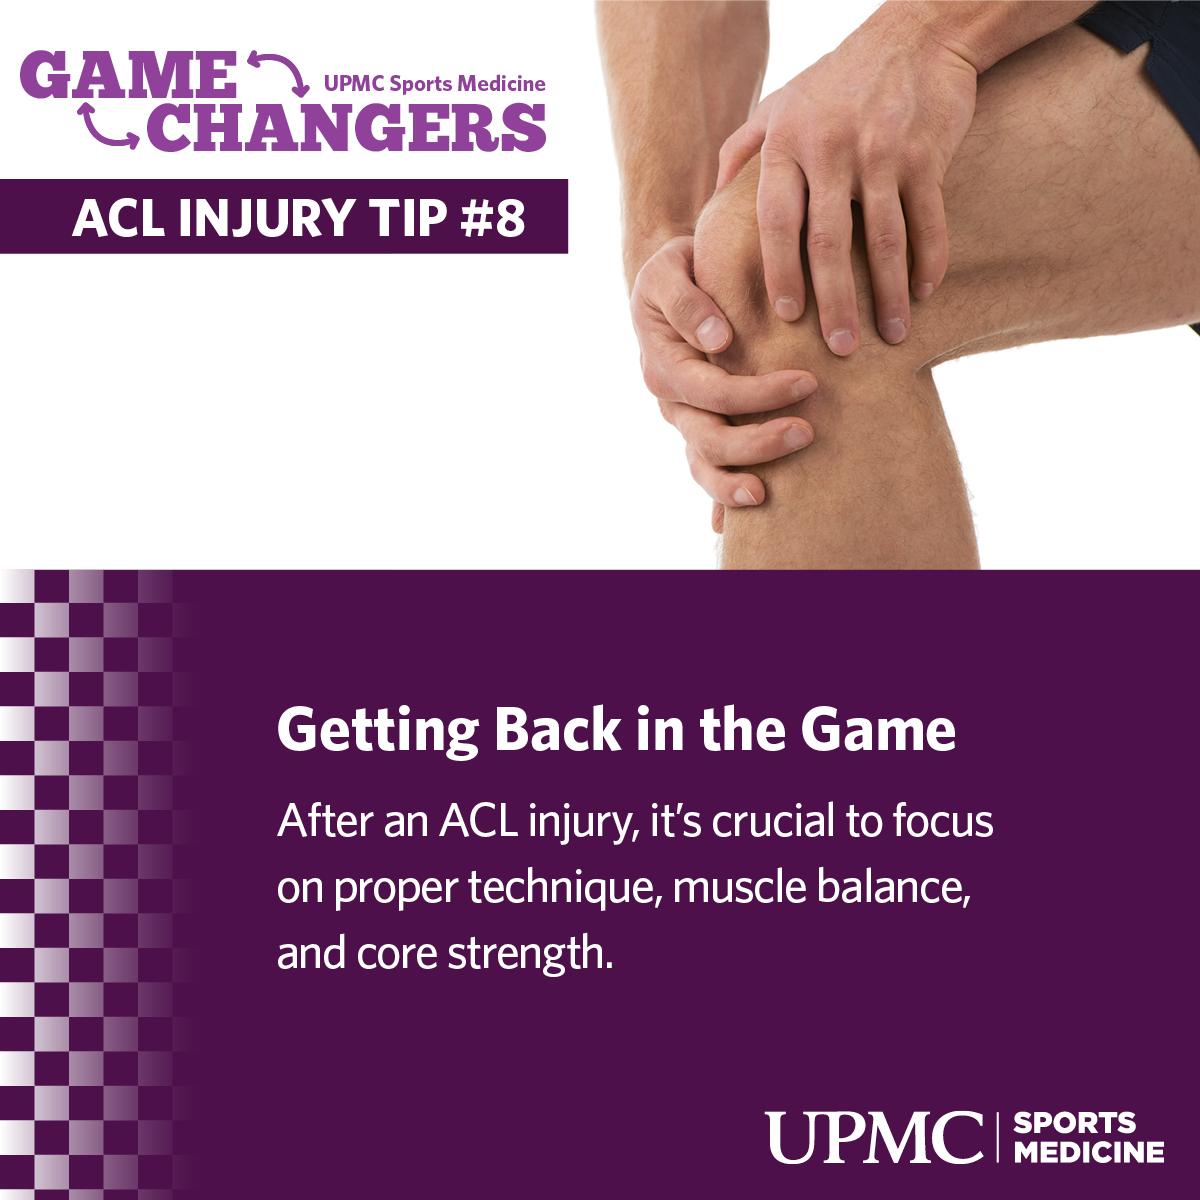 UPMC_GameChangers_ACL_FB8_FINAL